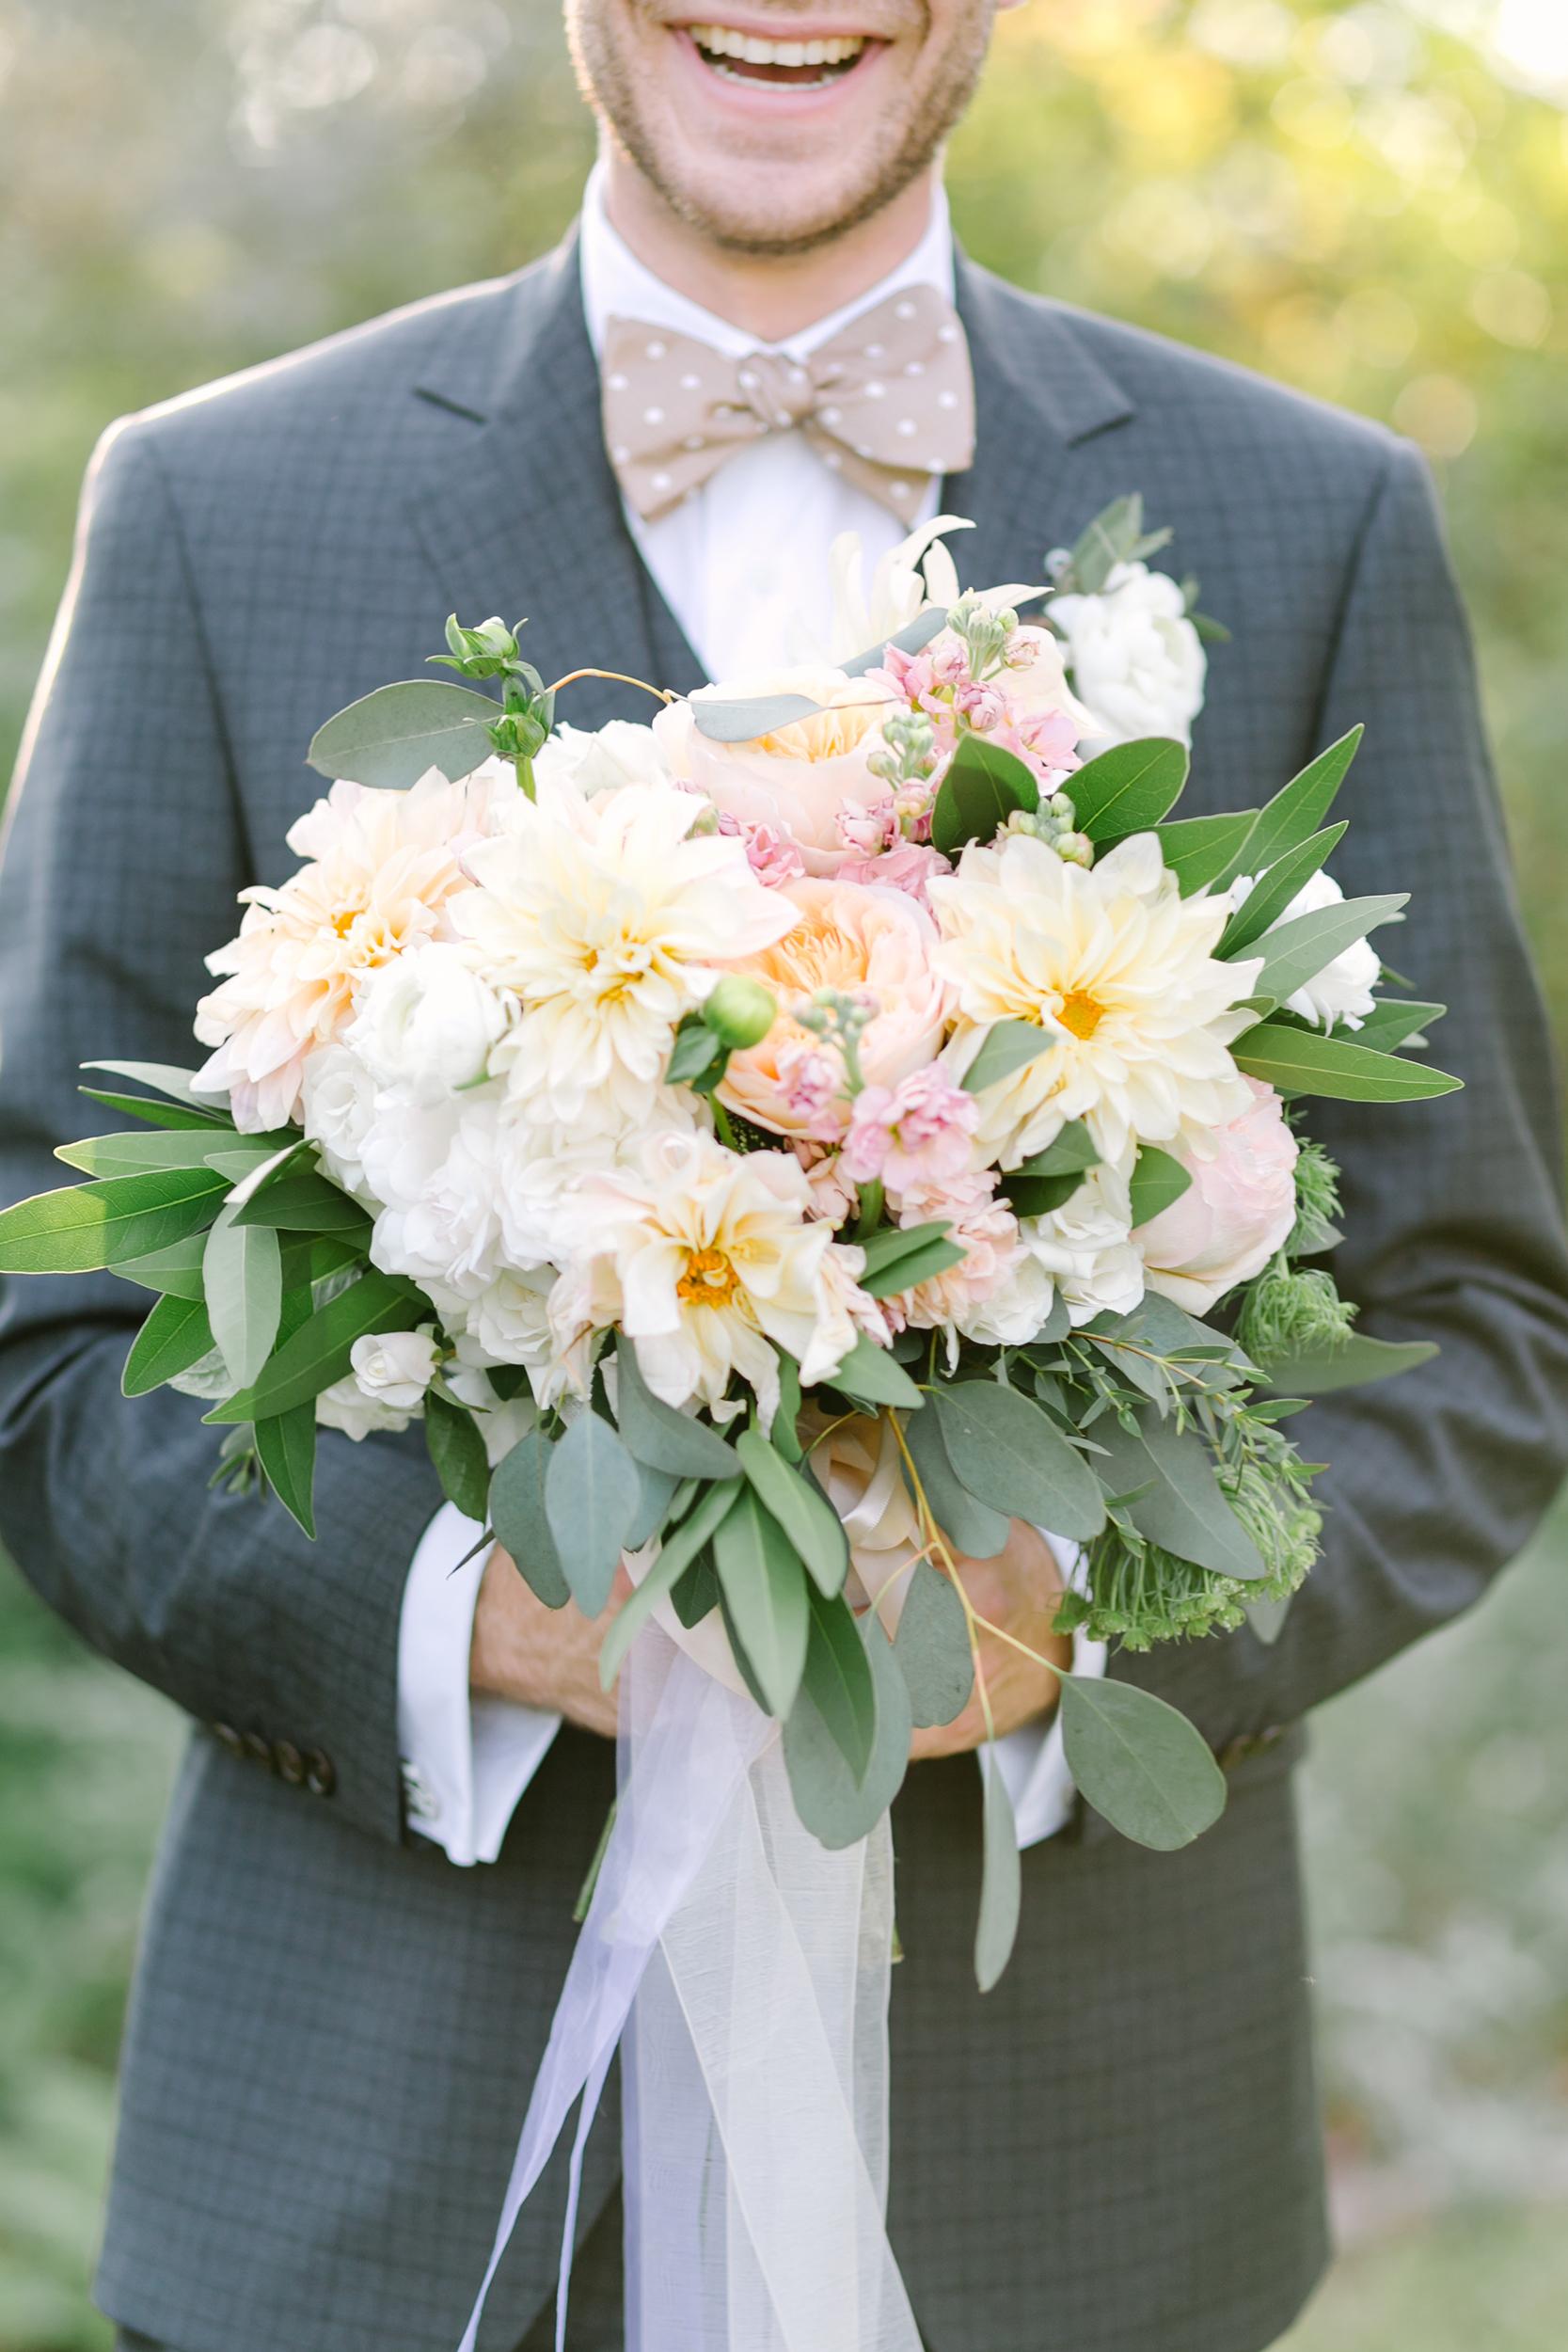 Austin_Wedding_Photographer_Kimberly_Brooke_Photographic_004.jpg